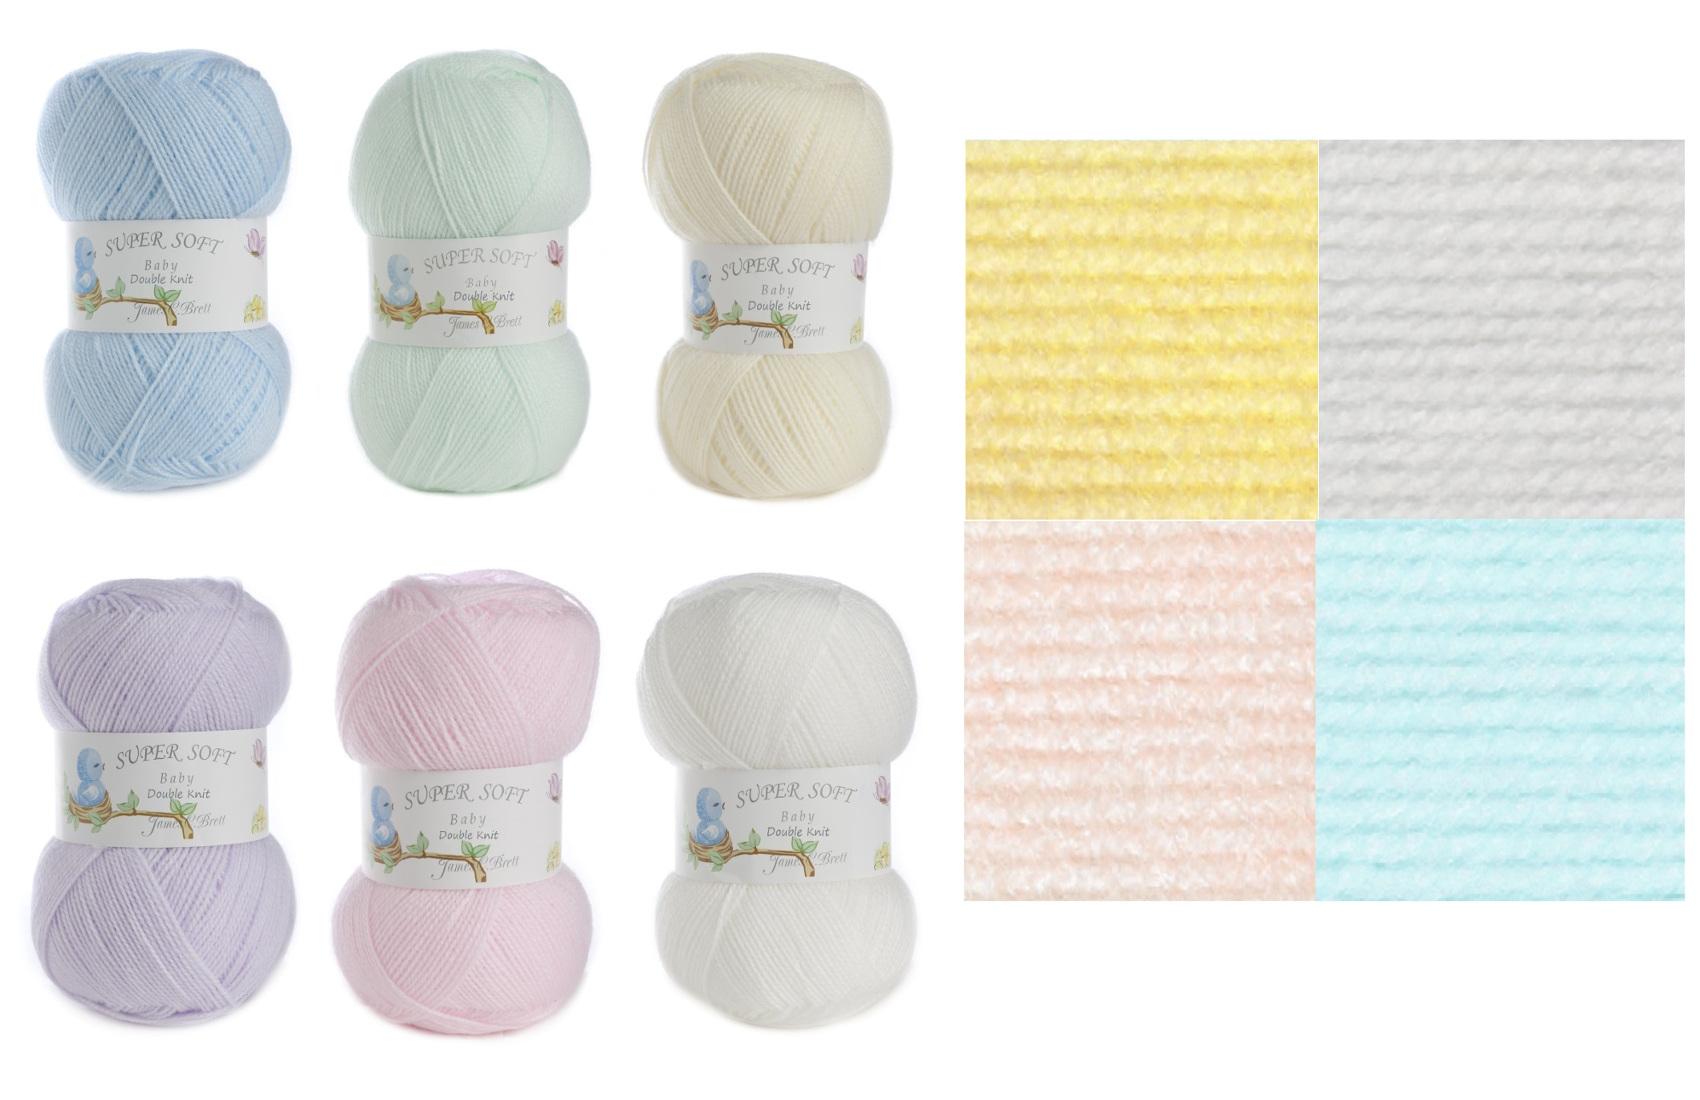 James C Brett Baby Double Knitting Yarn 100g soft 100/% Acrylic Shade BB9 Cream